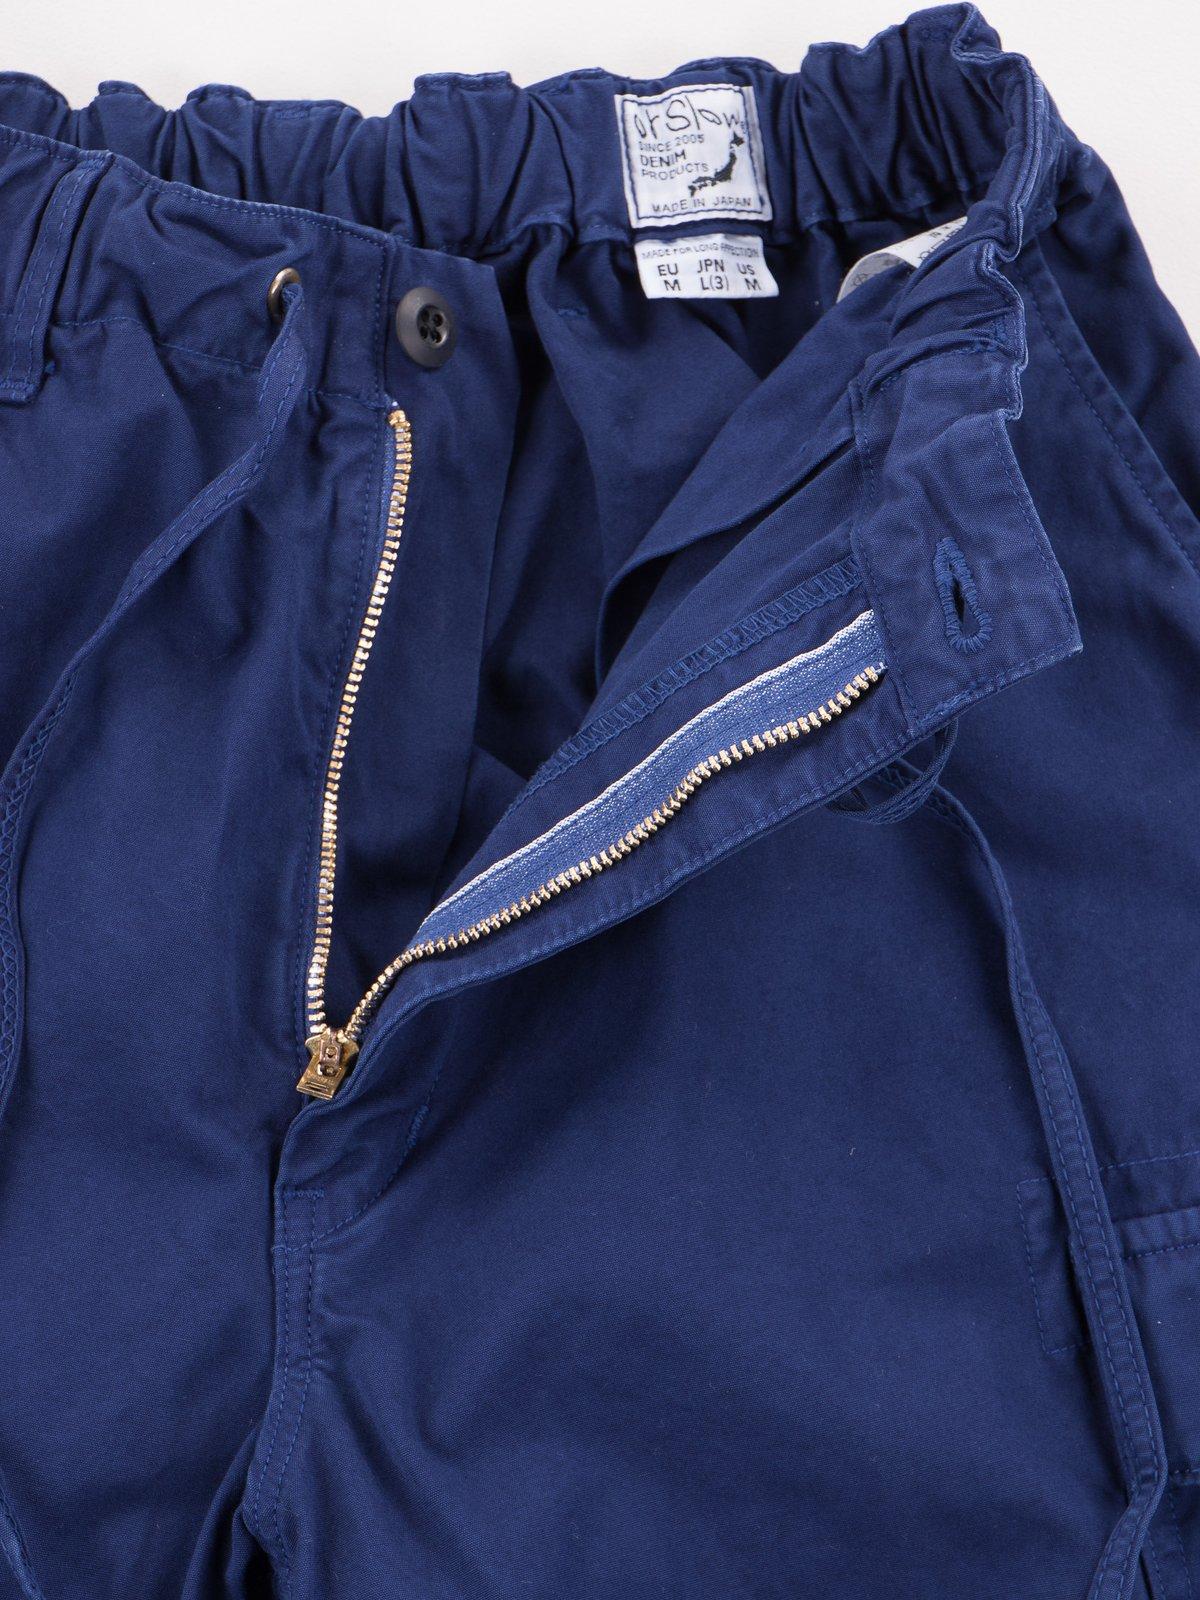 Ink Blue Poplin Easy Cargo Pant - Image 7